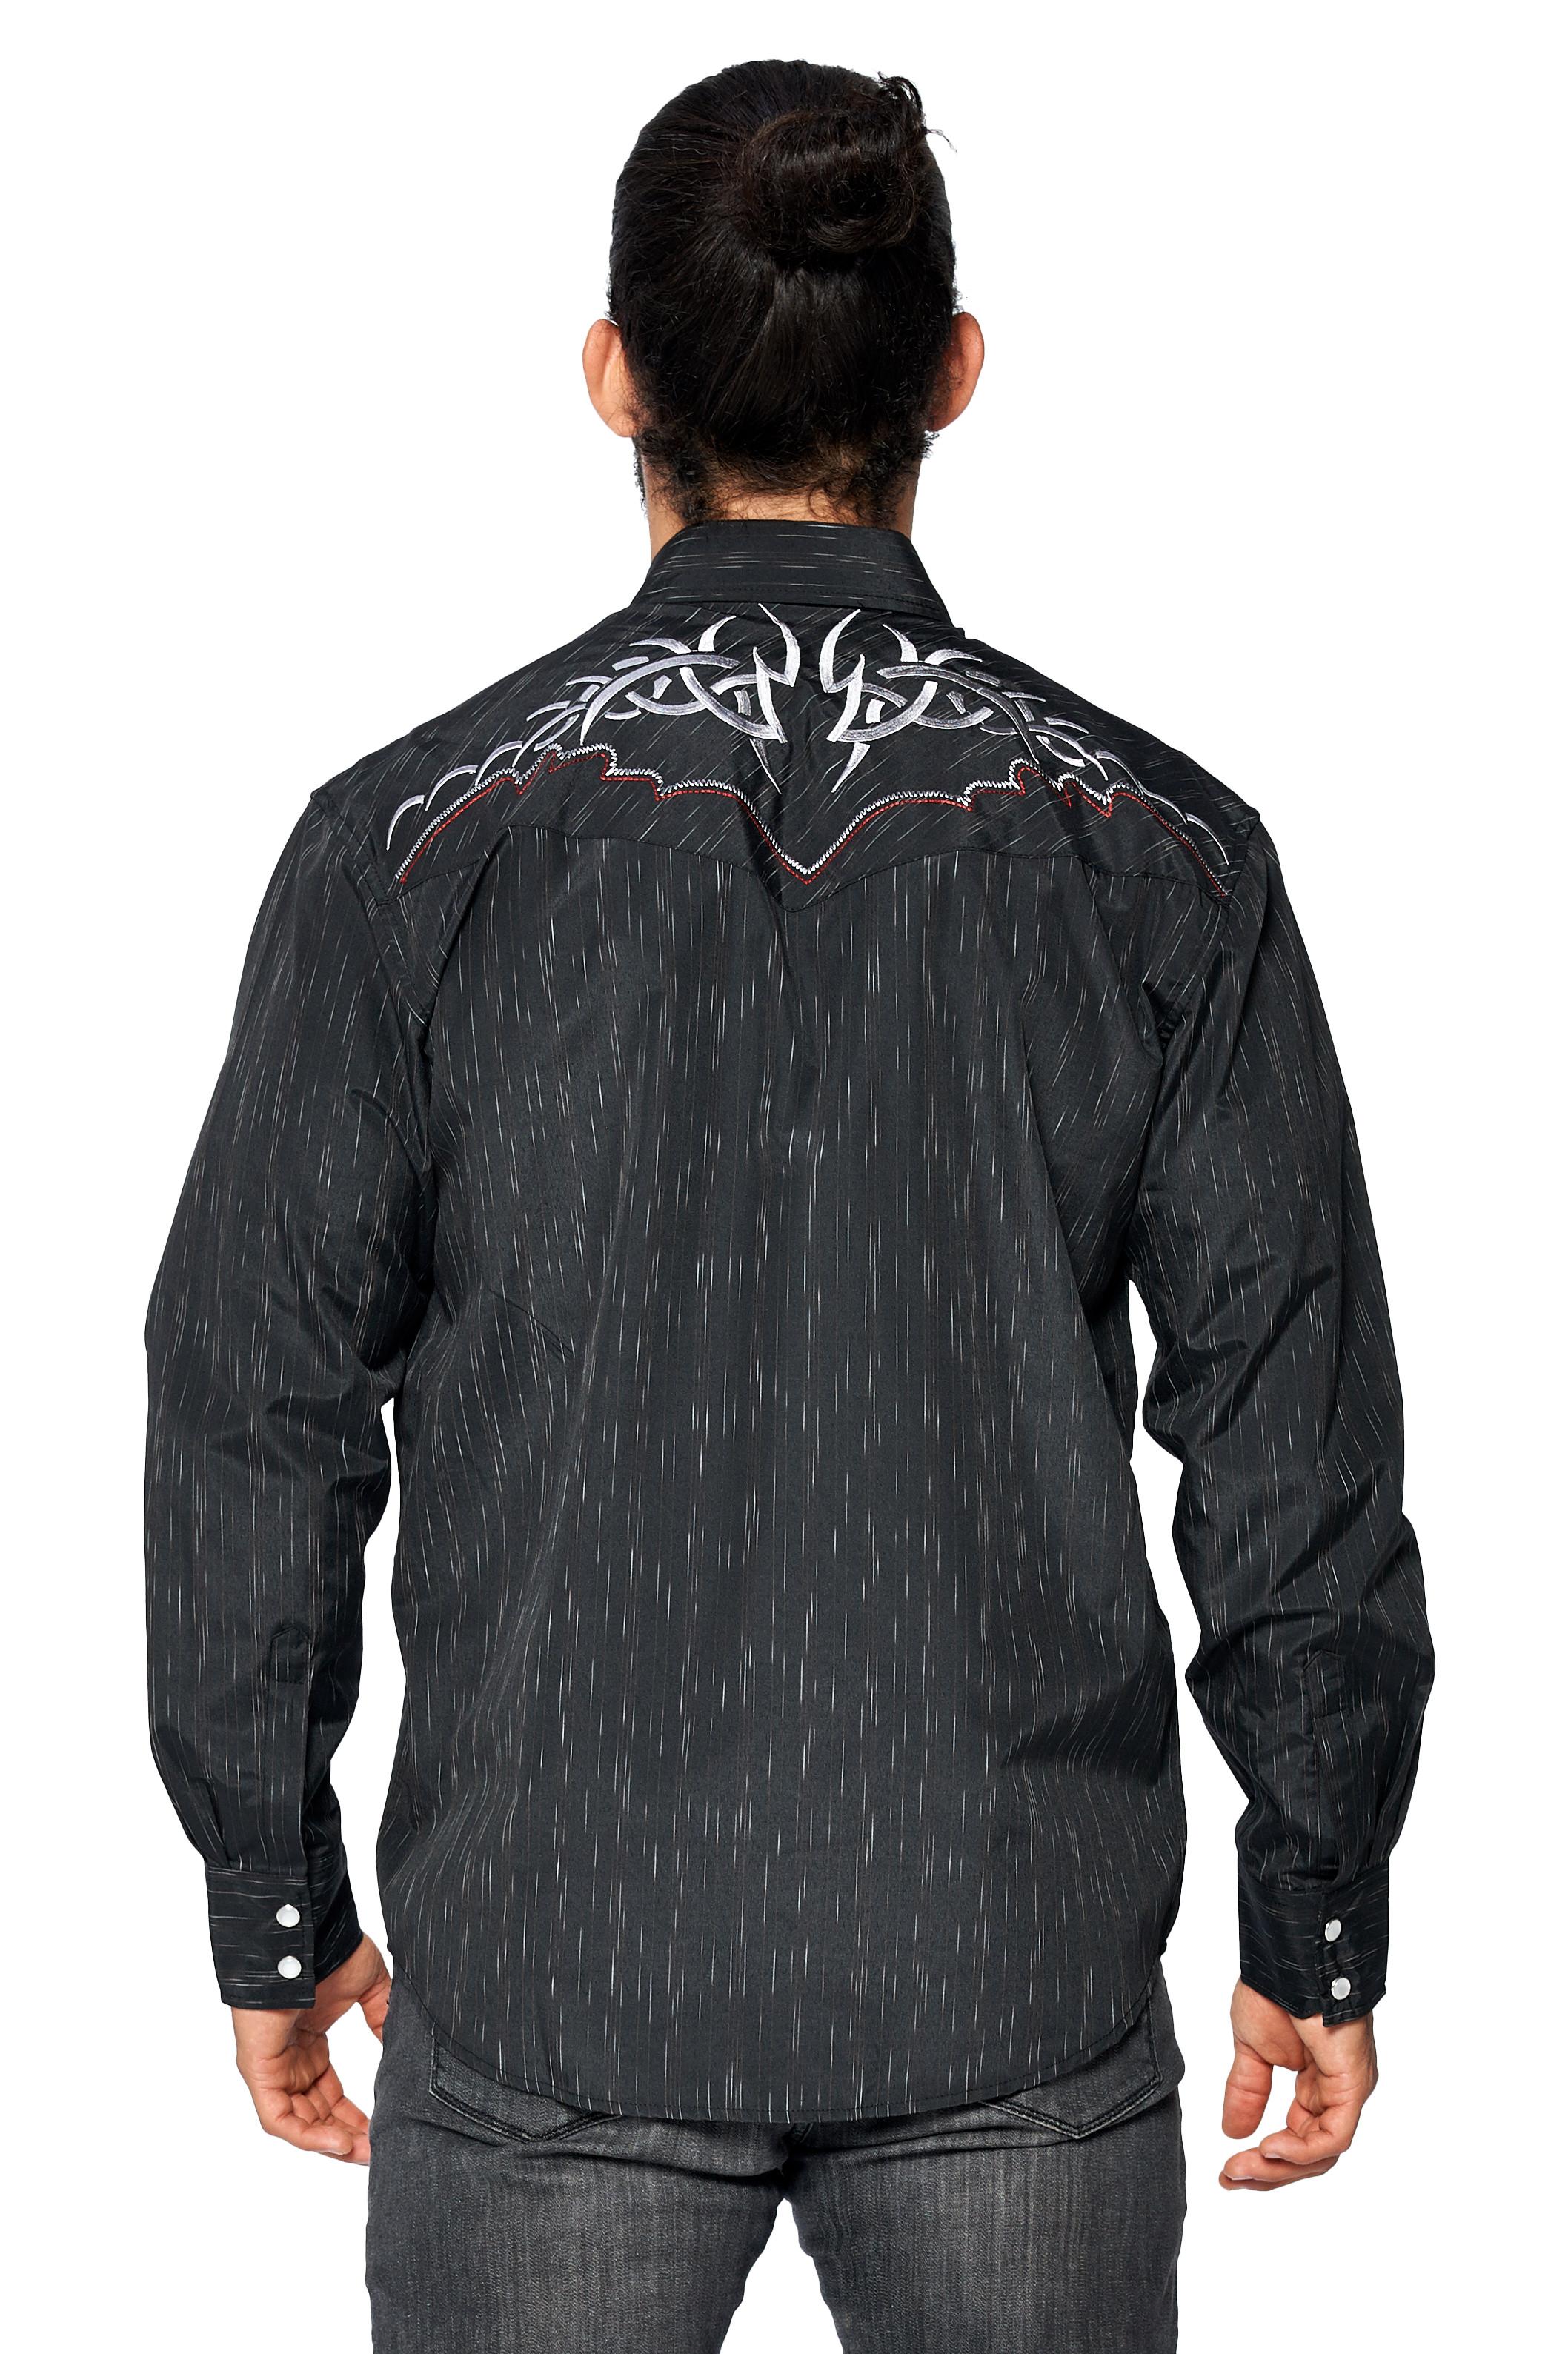 LW-Men-039-s-Pearl-Snap-Tribal-Stylish-Printed-Woven-Western-Vaquero-Rodeo-Shirt thumbnail 75